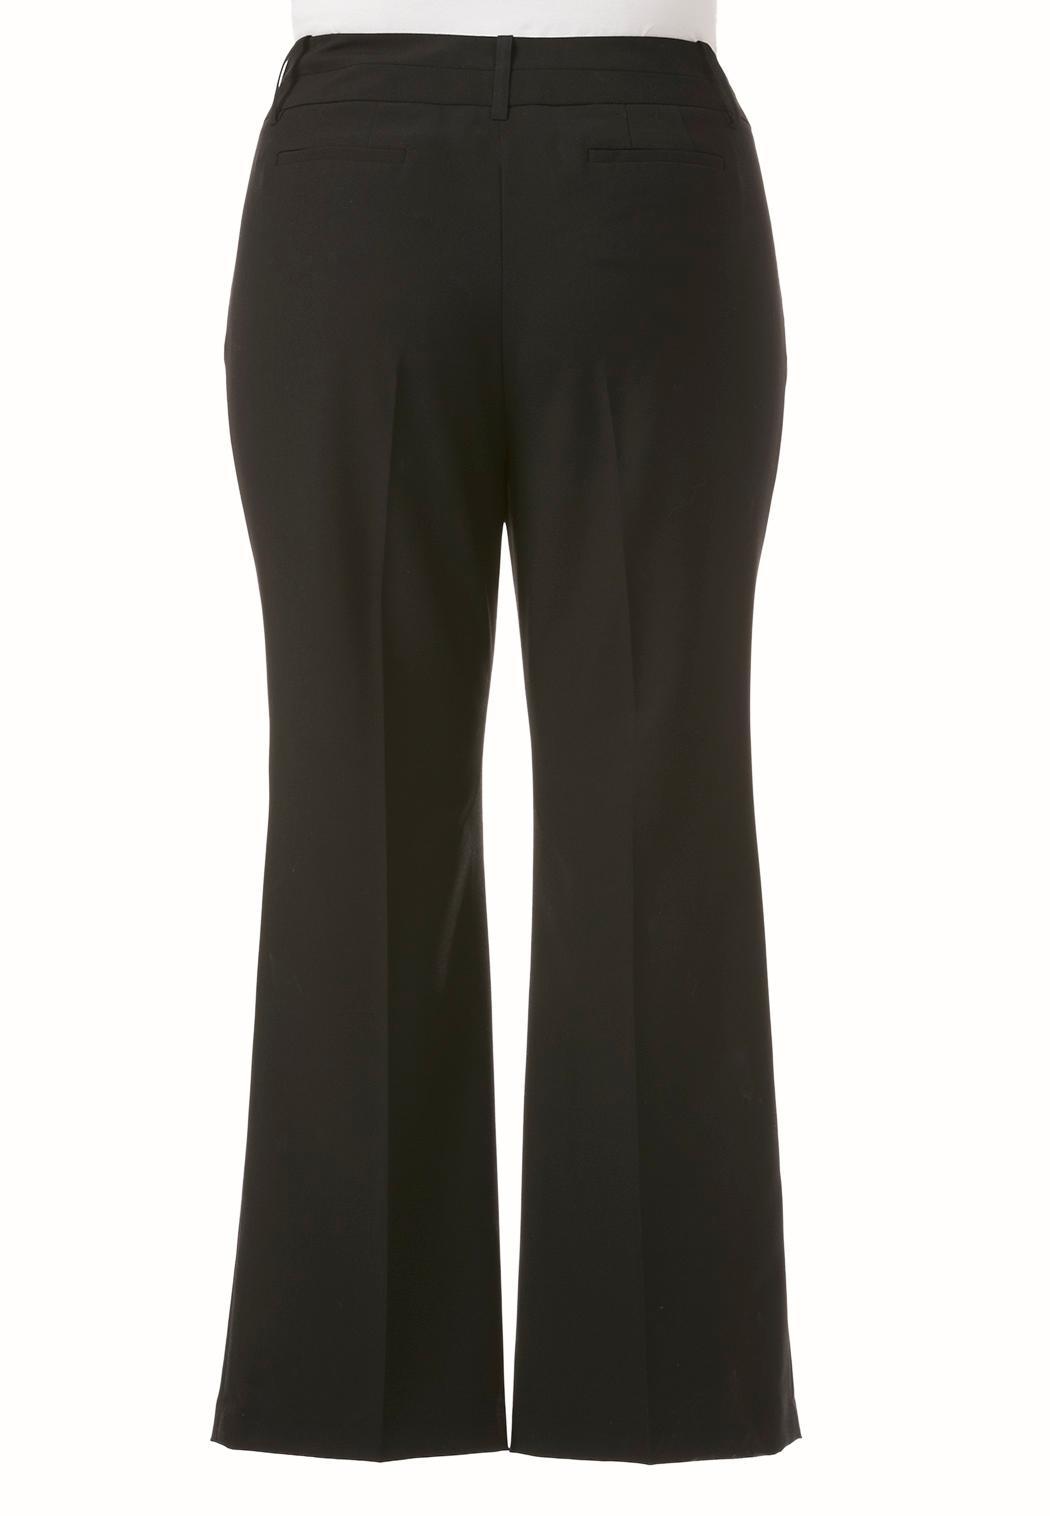 Plus Extended Curvy Shape Enhancing Trousers (Item #43553796)